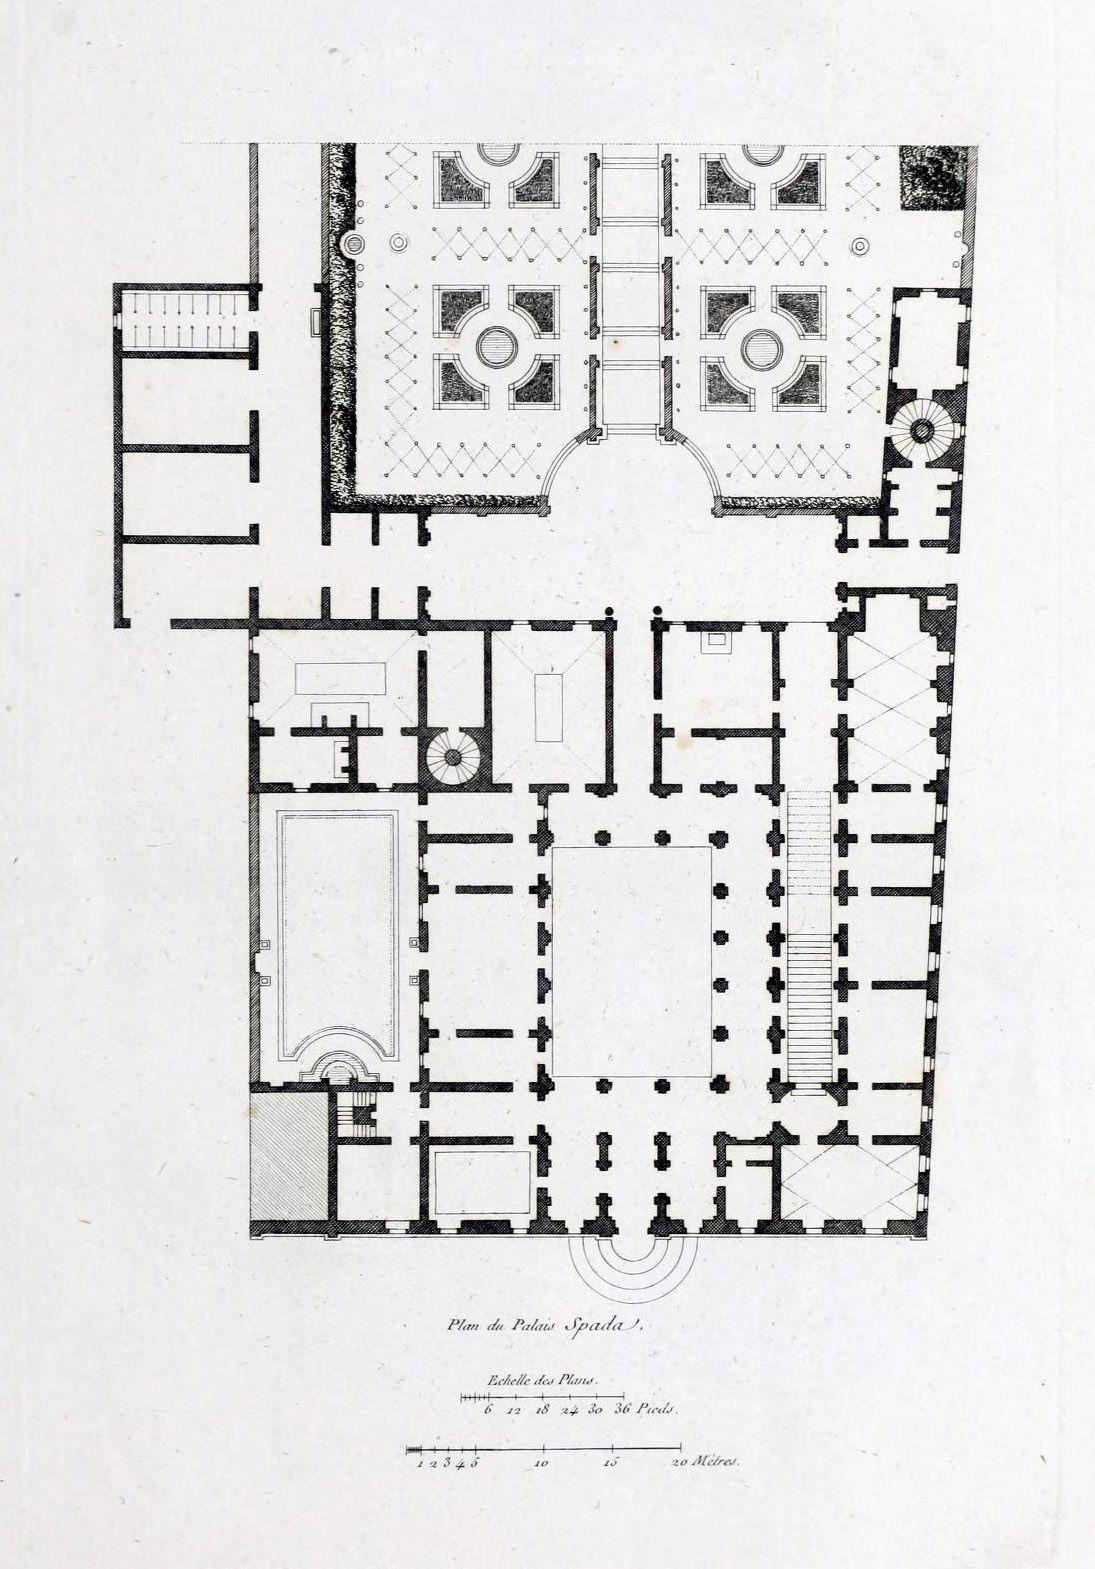 Floor Plan Of The Palazzo Spada Rome